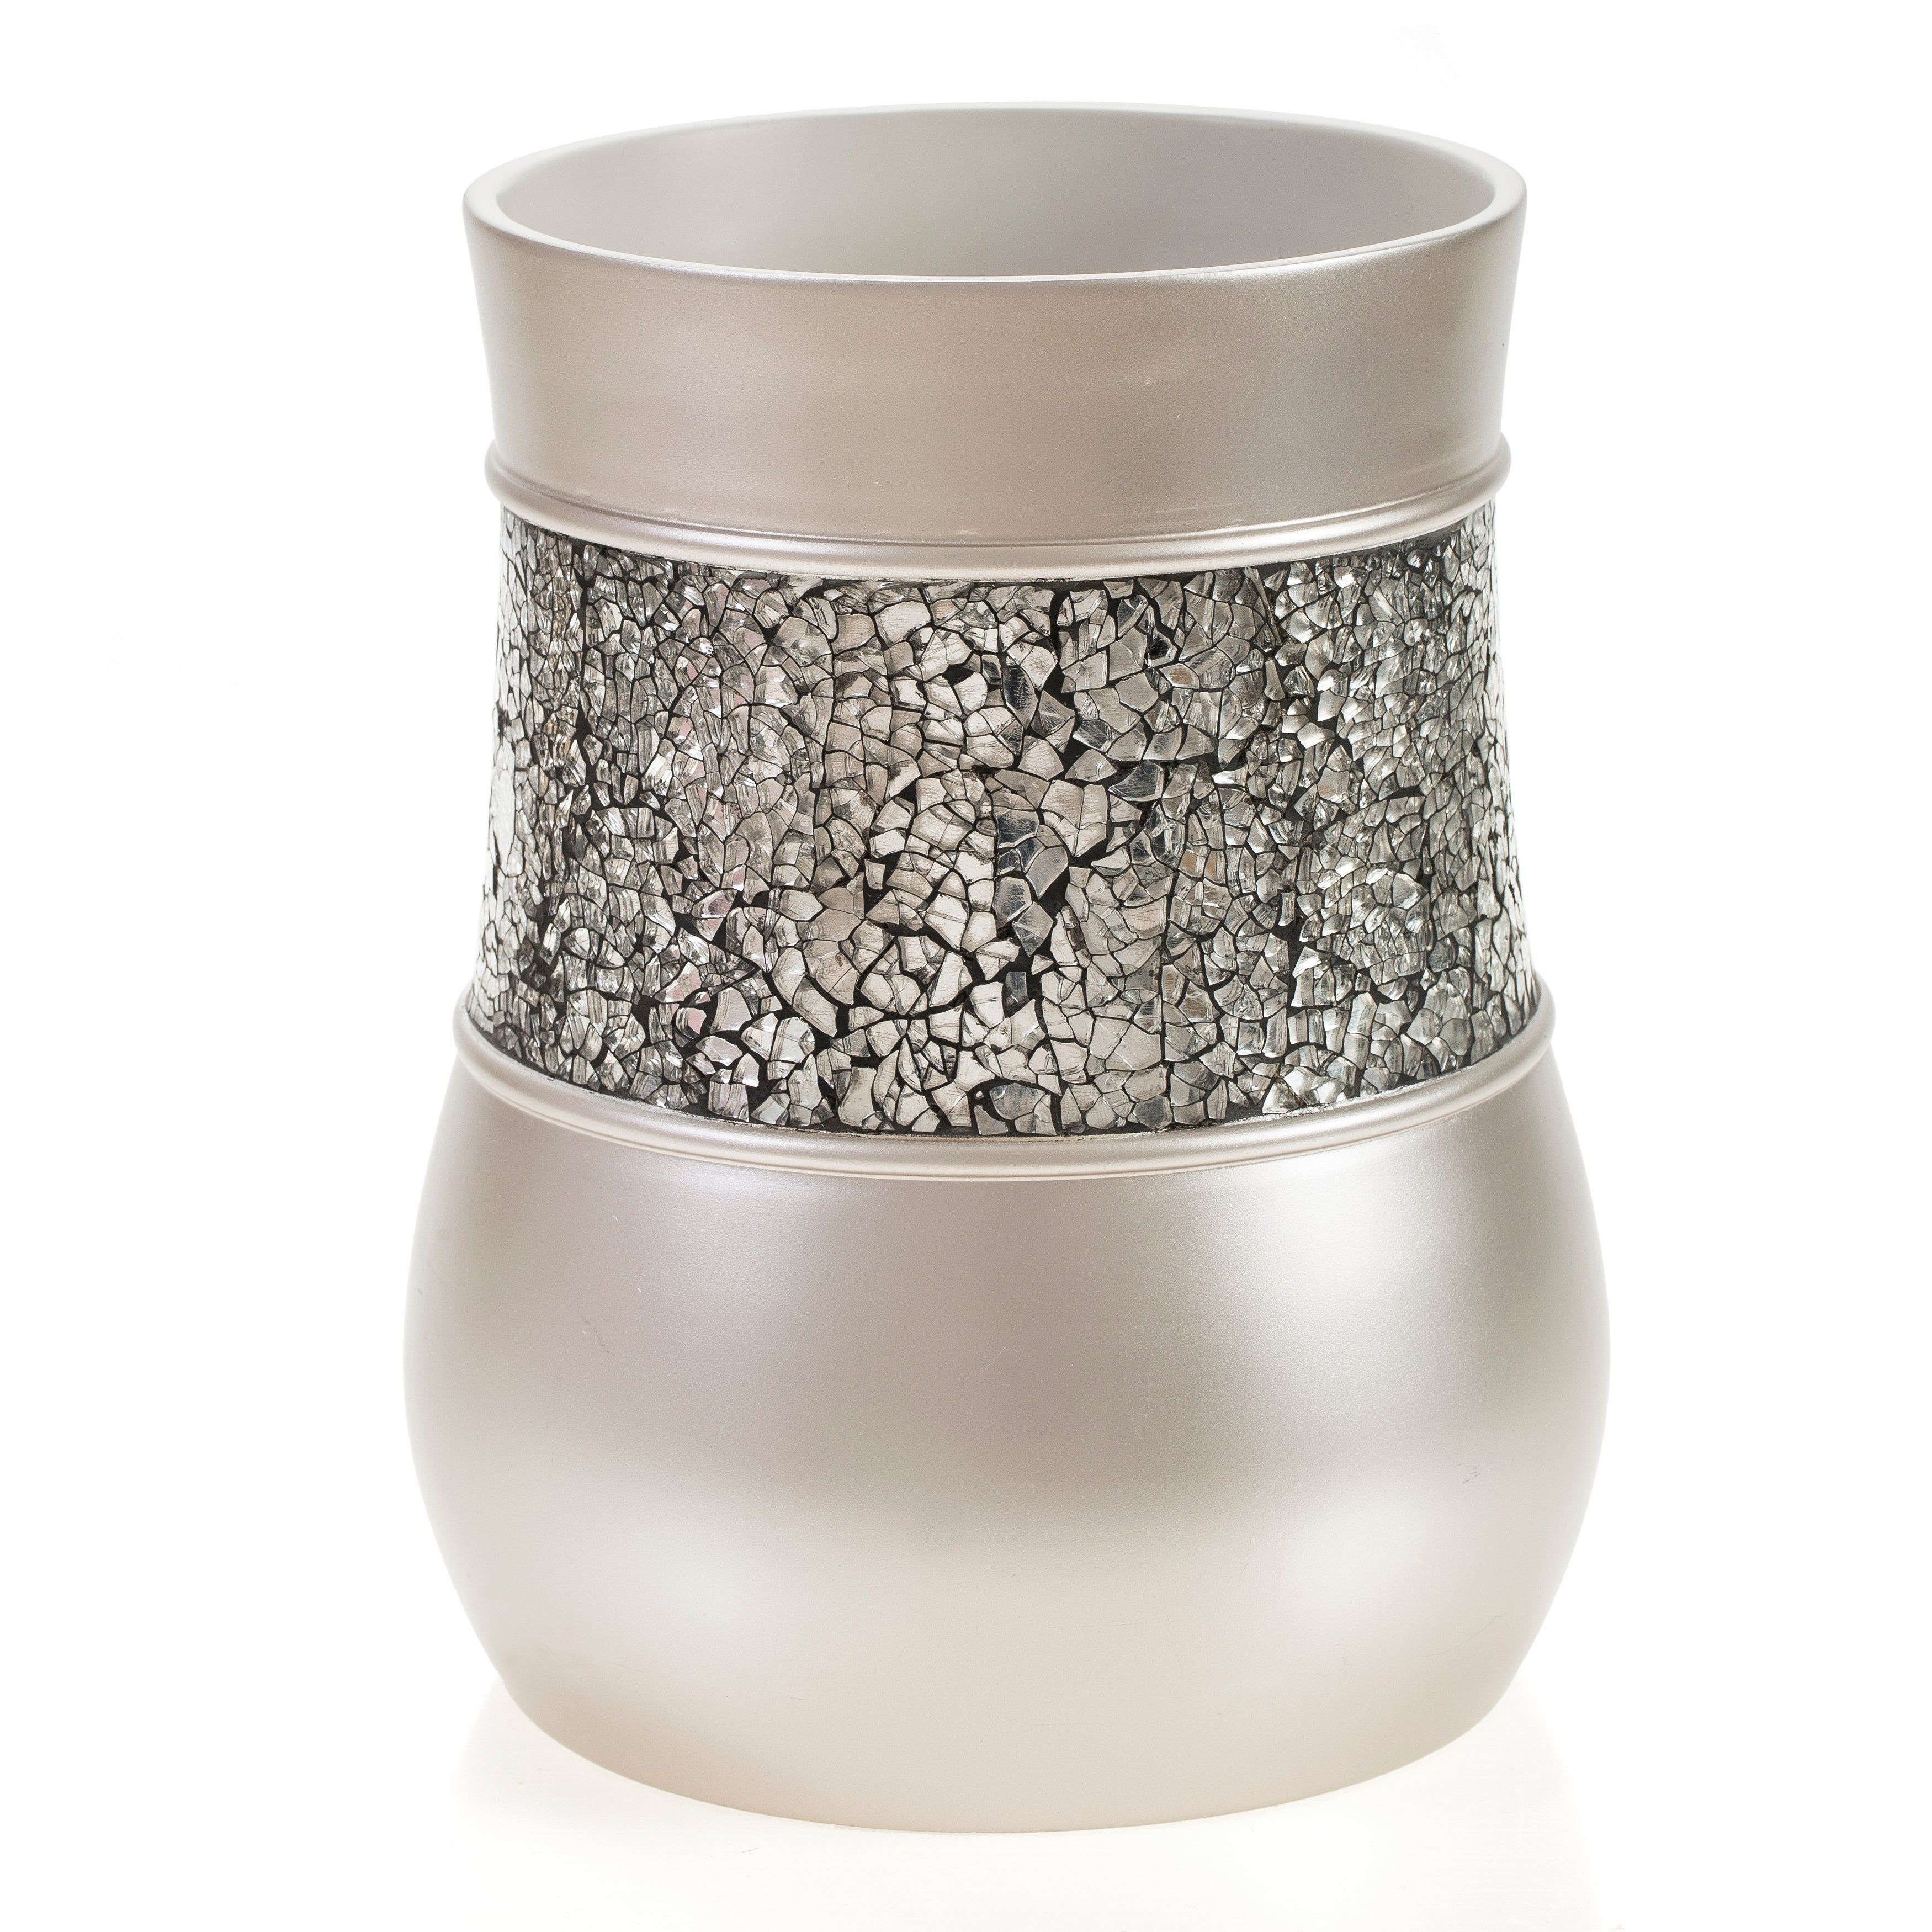 Brushed Nickle Bathroom Trash Can Wastebasket Gray Creative Scents In 2020 Brushed Nickel Waste Paper Bathroom Tumbler